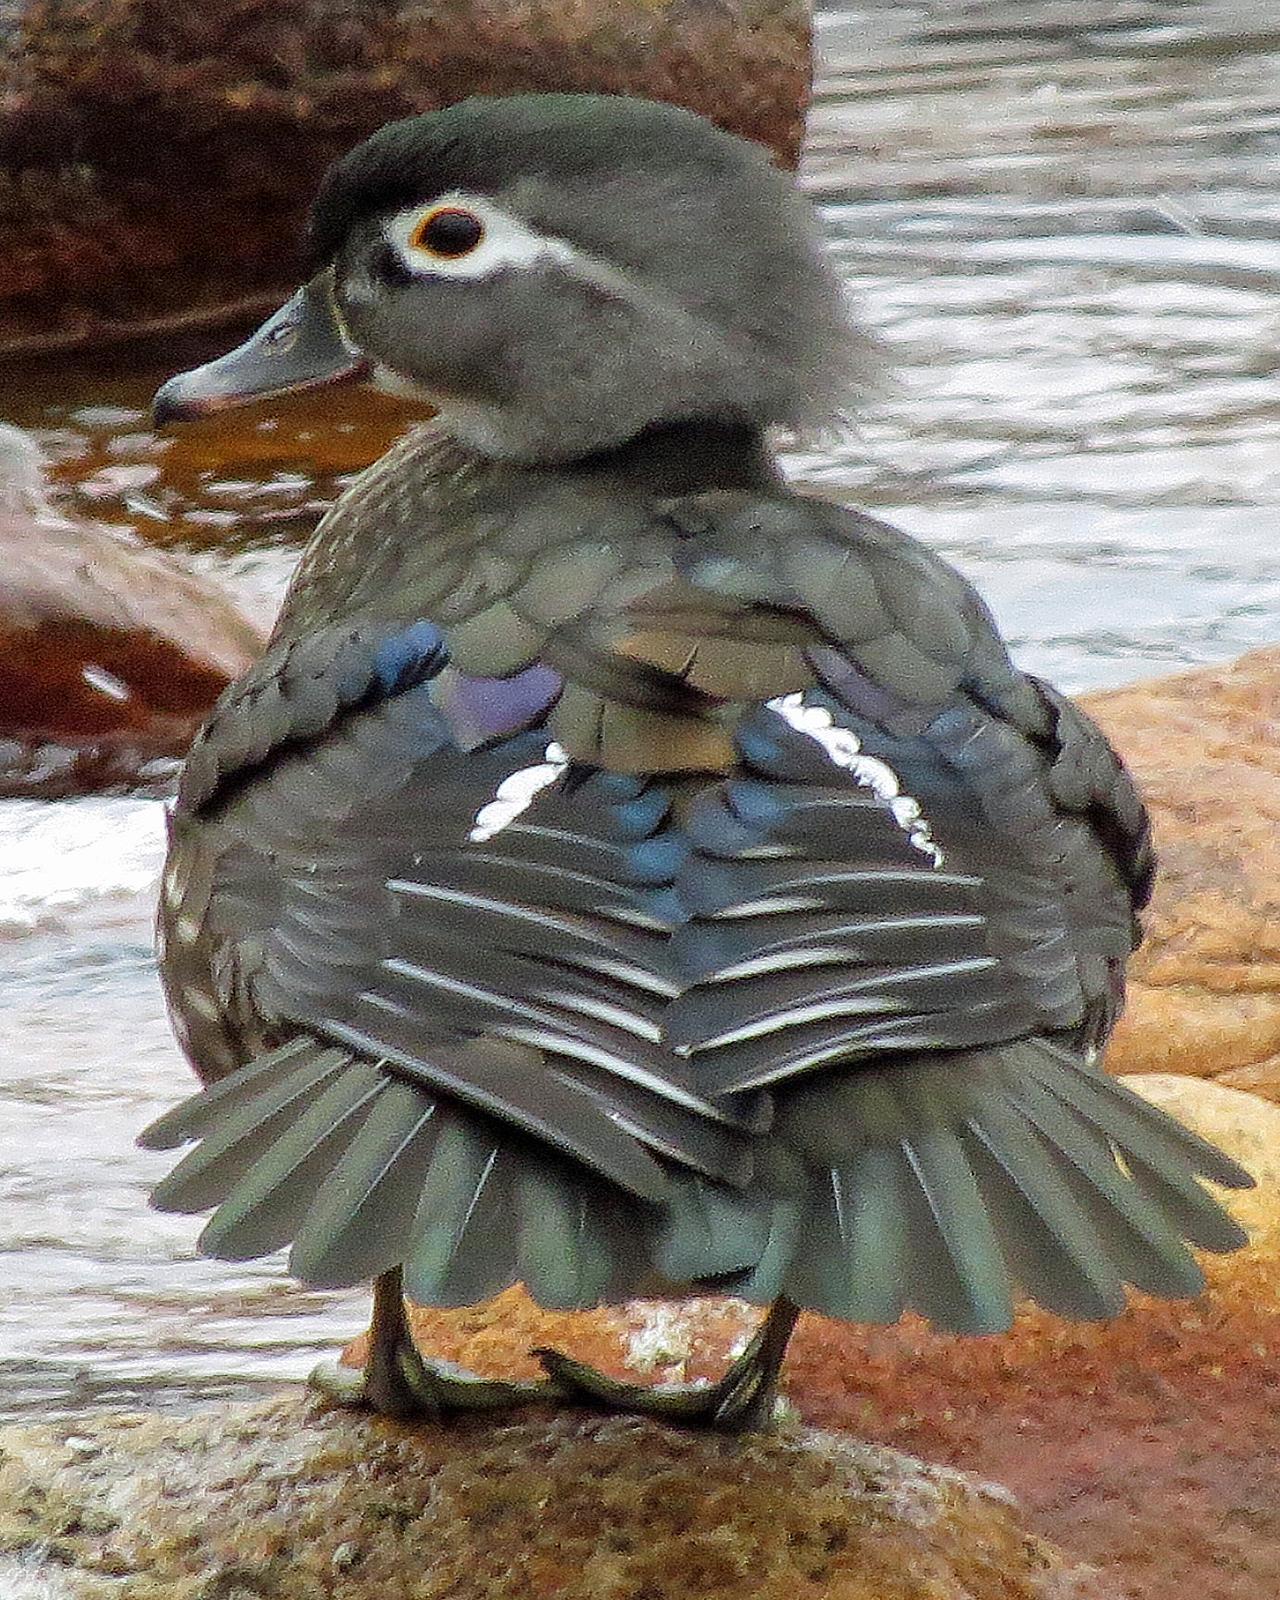 Wood Duck Photo by Kelly Preheim